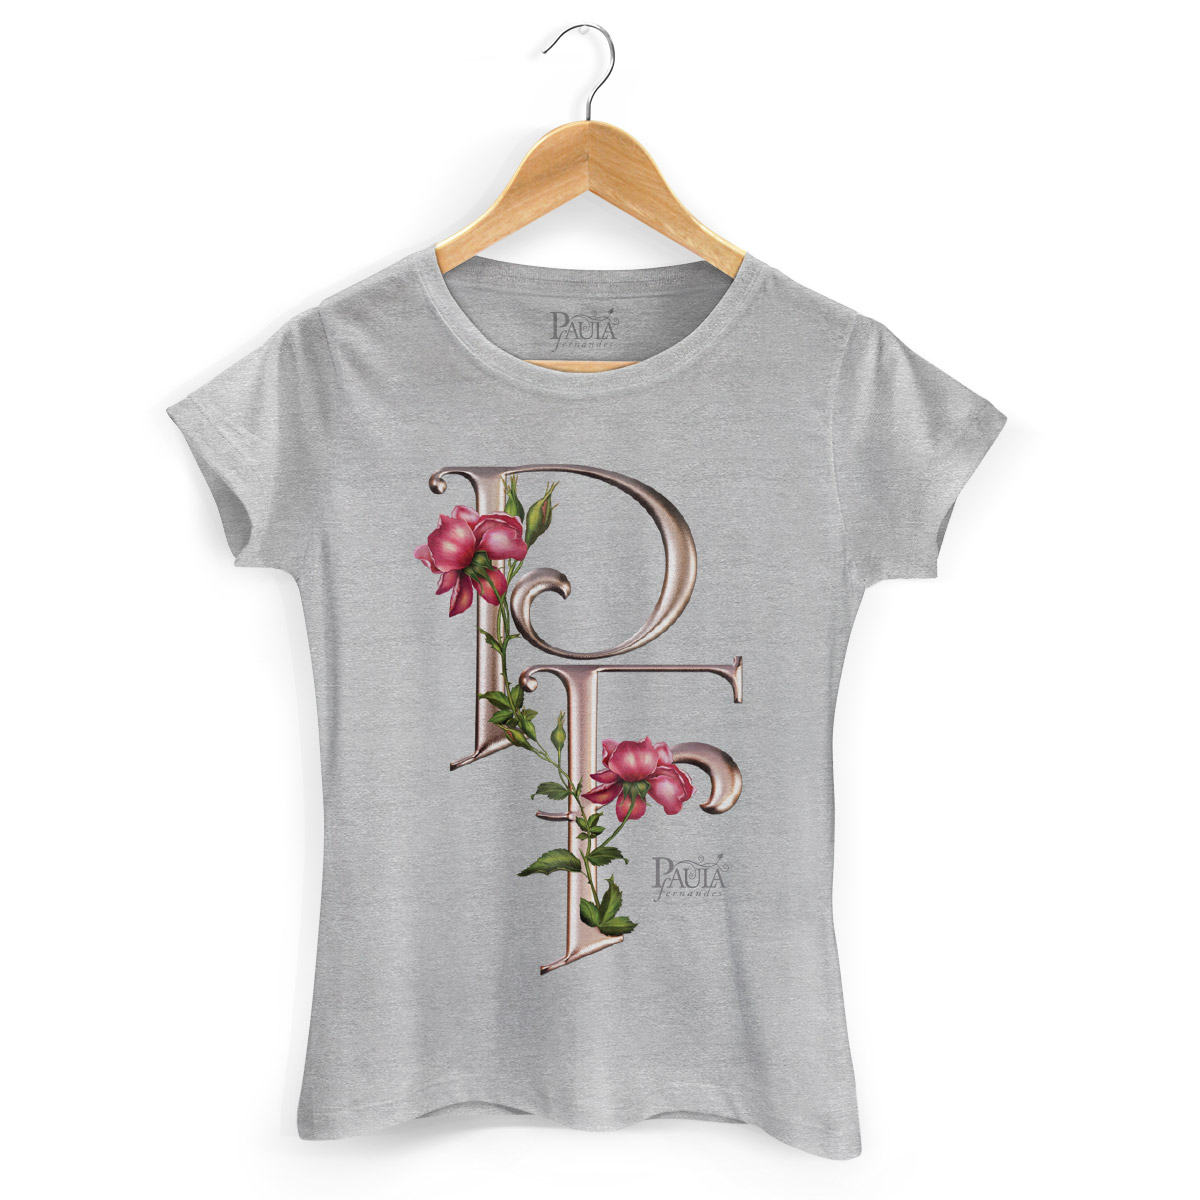 Camiseta Feminina Paula Fernandes Flowers